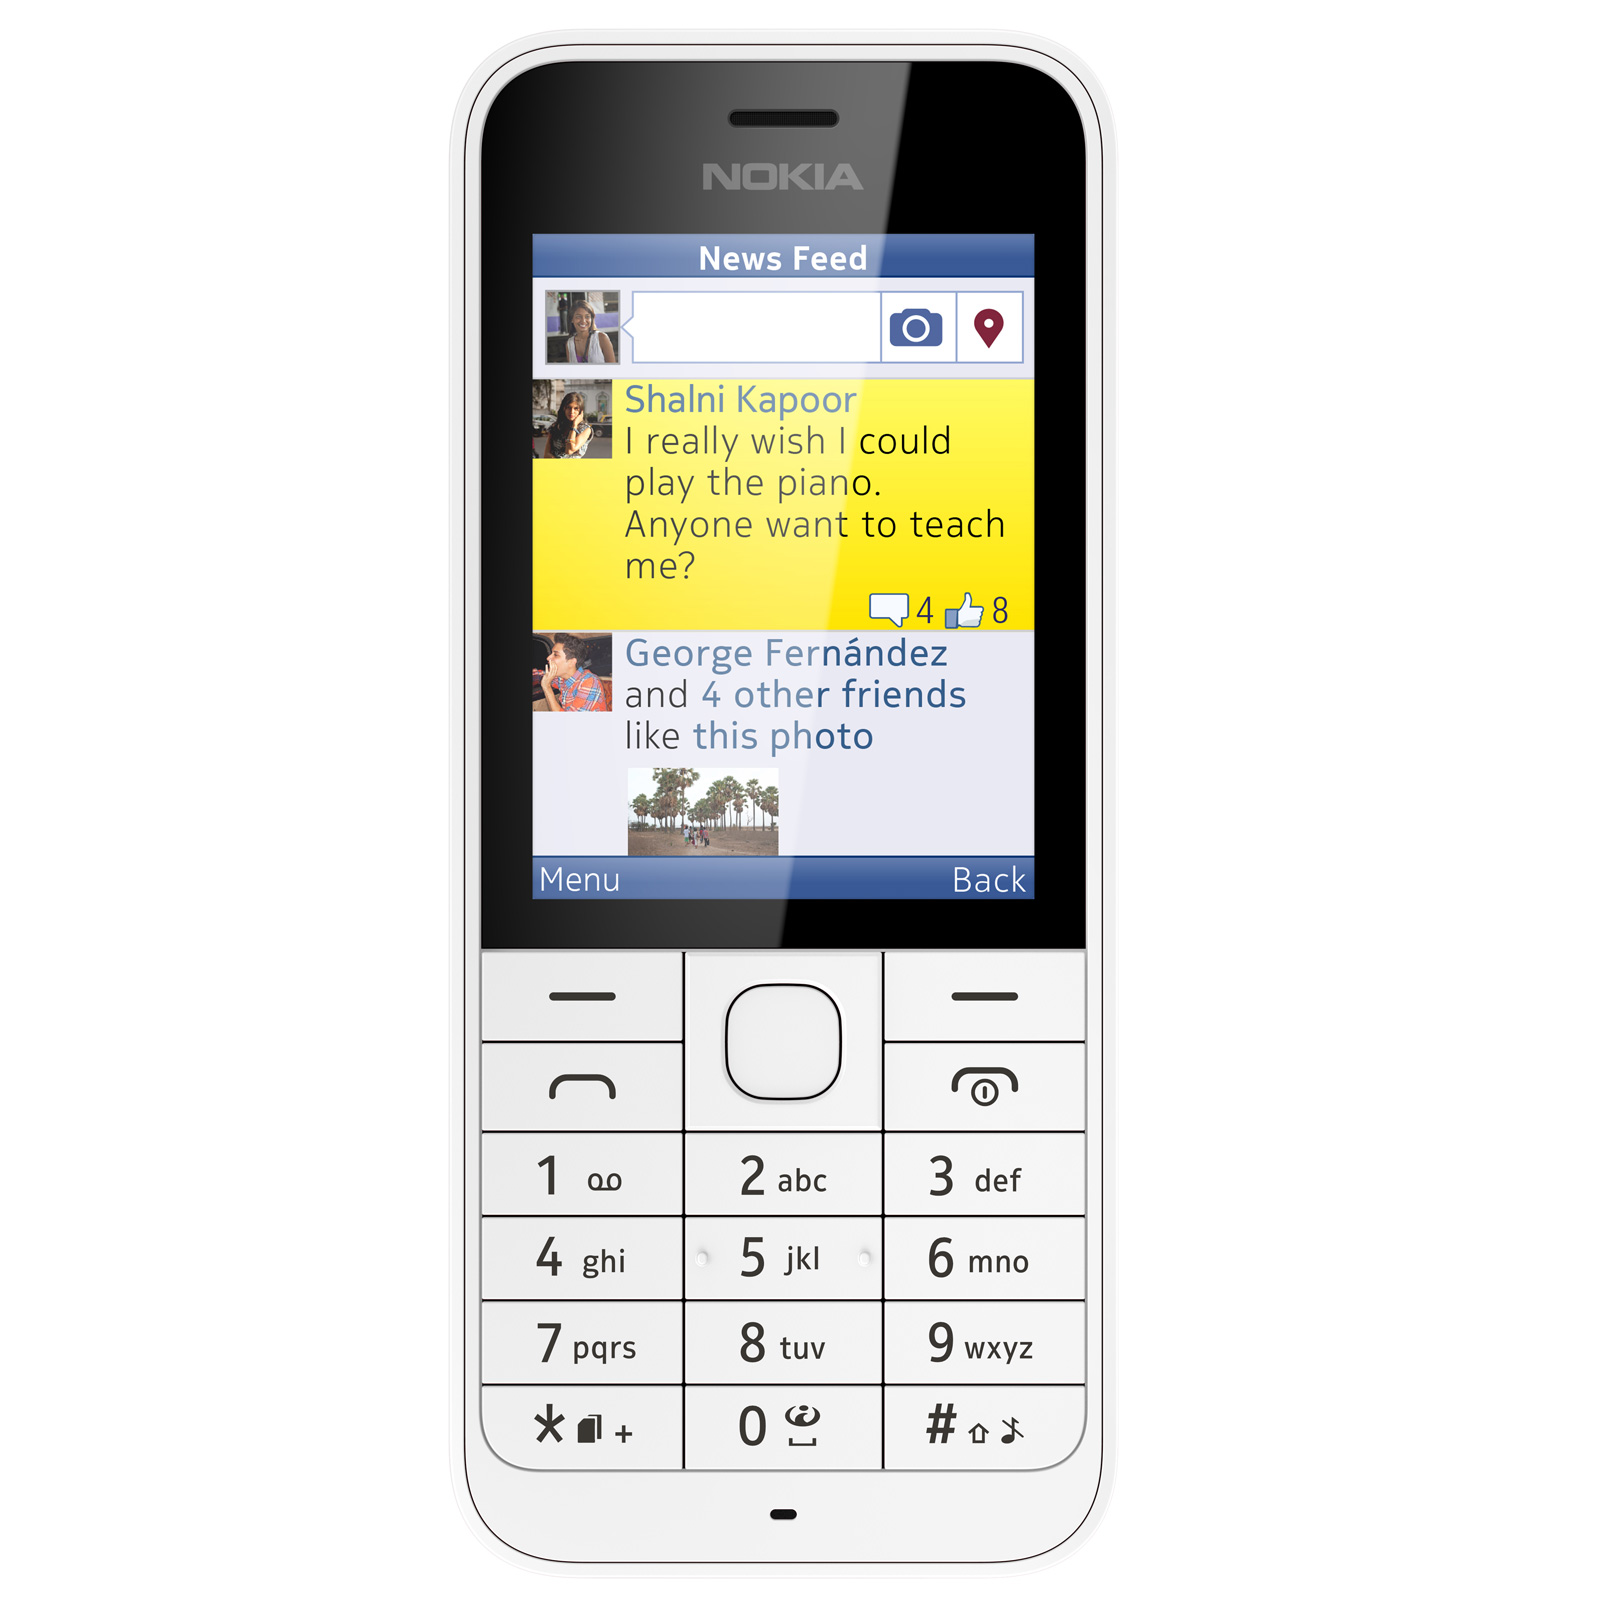 nokia 220 dual sim blanc mobile smartphone nokia sur ldlc. Black Bedroom Furniture Sets. Home Design Ideas